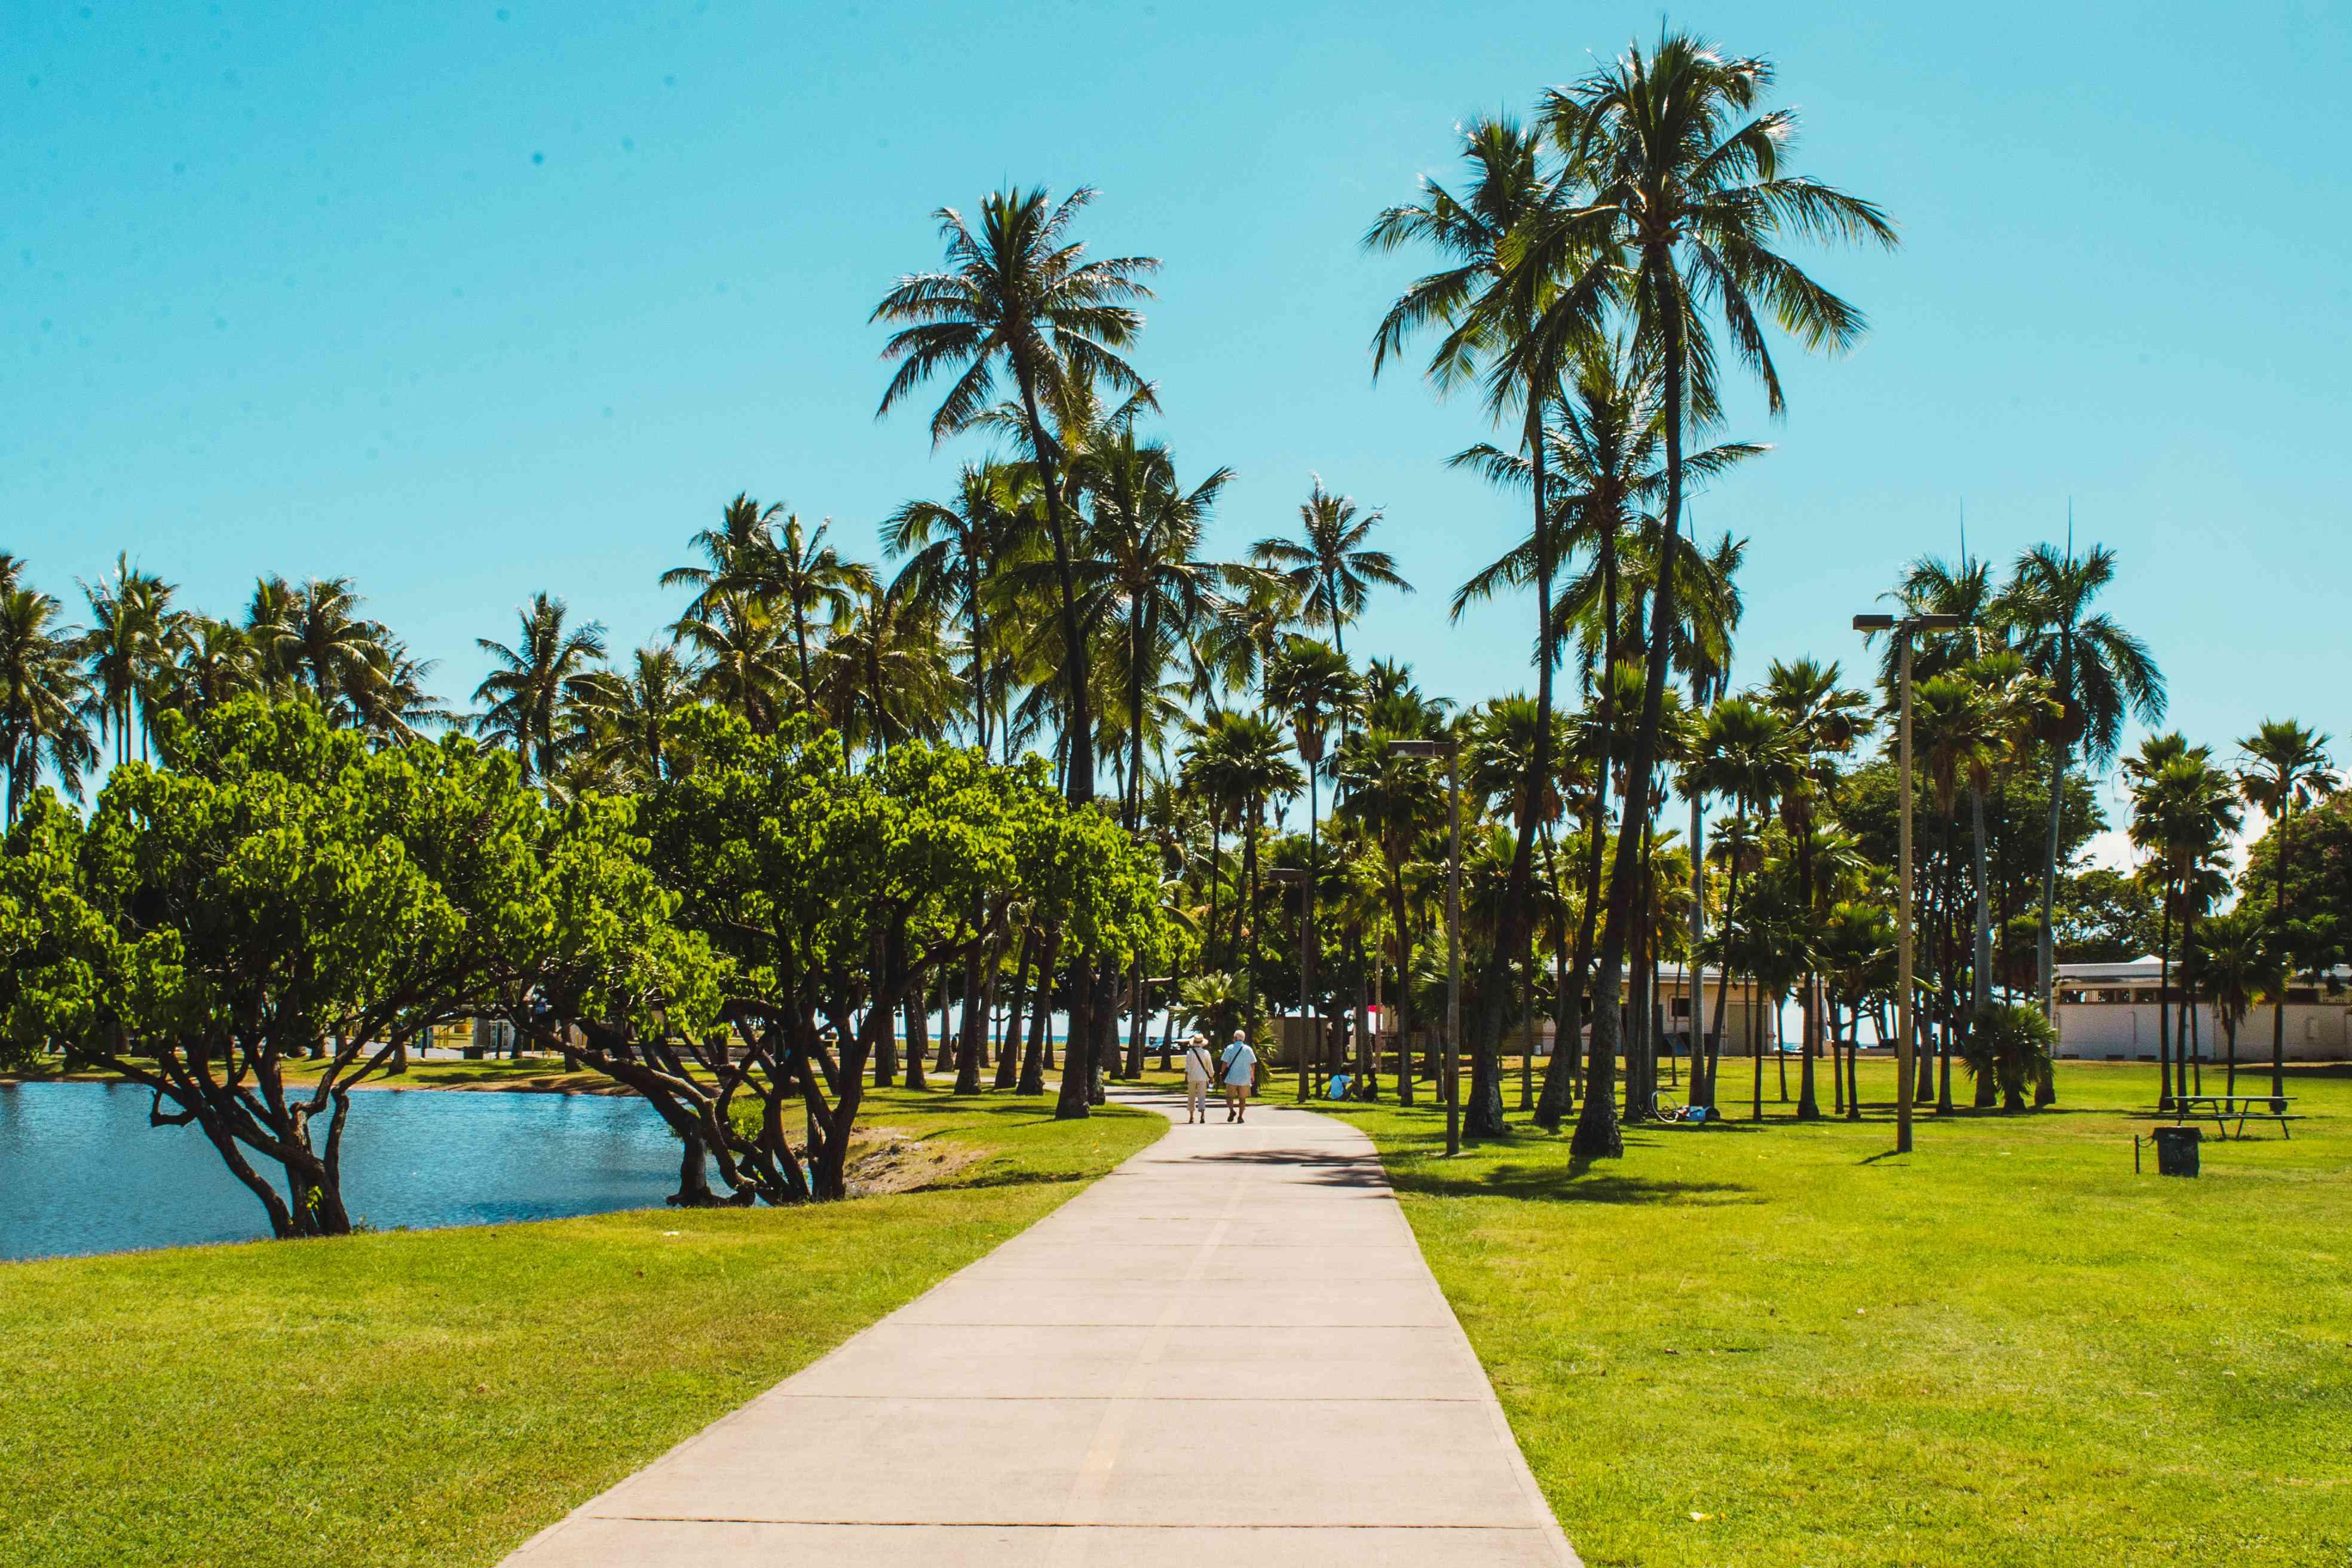 Parque de la playa de Ala Moana